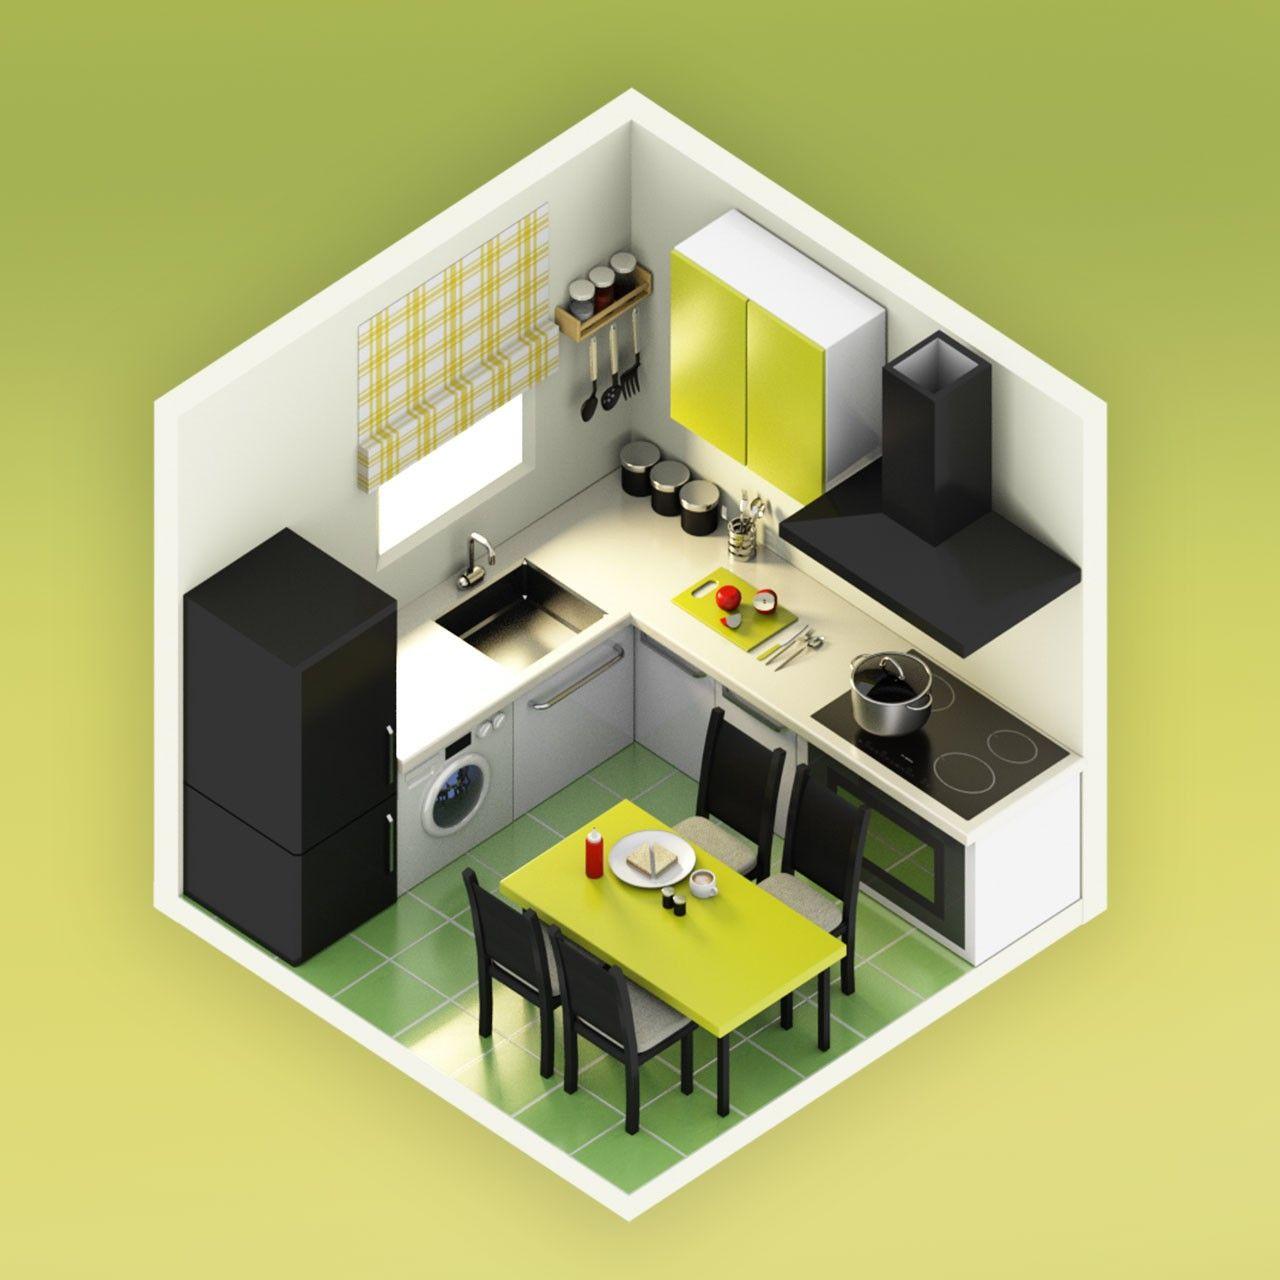 Isometric 3d Model Of Kitchen Kitchen Design Interior Room Design